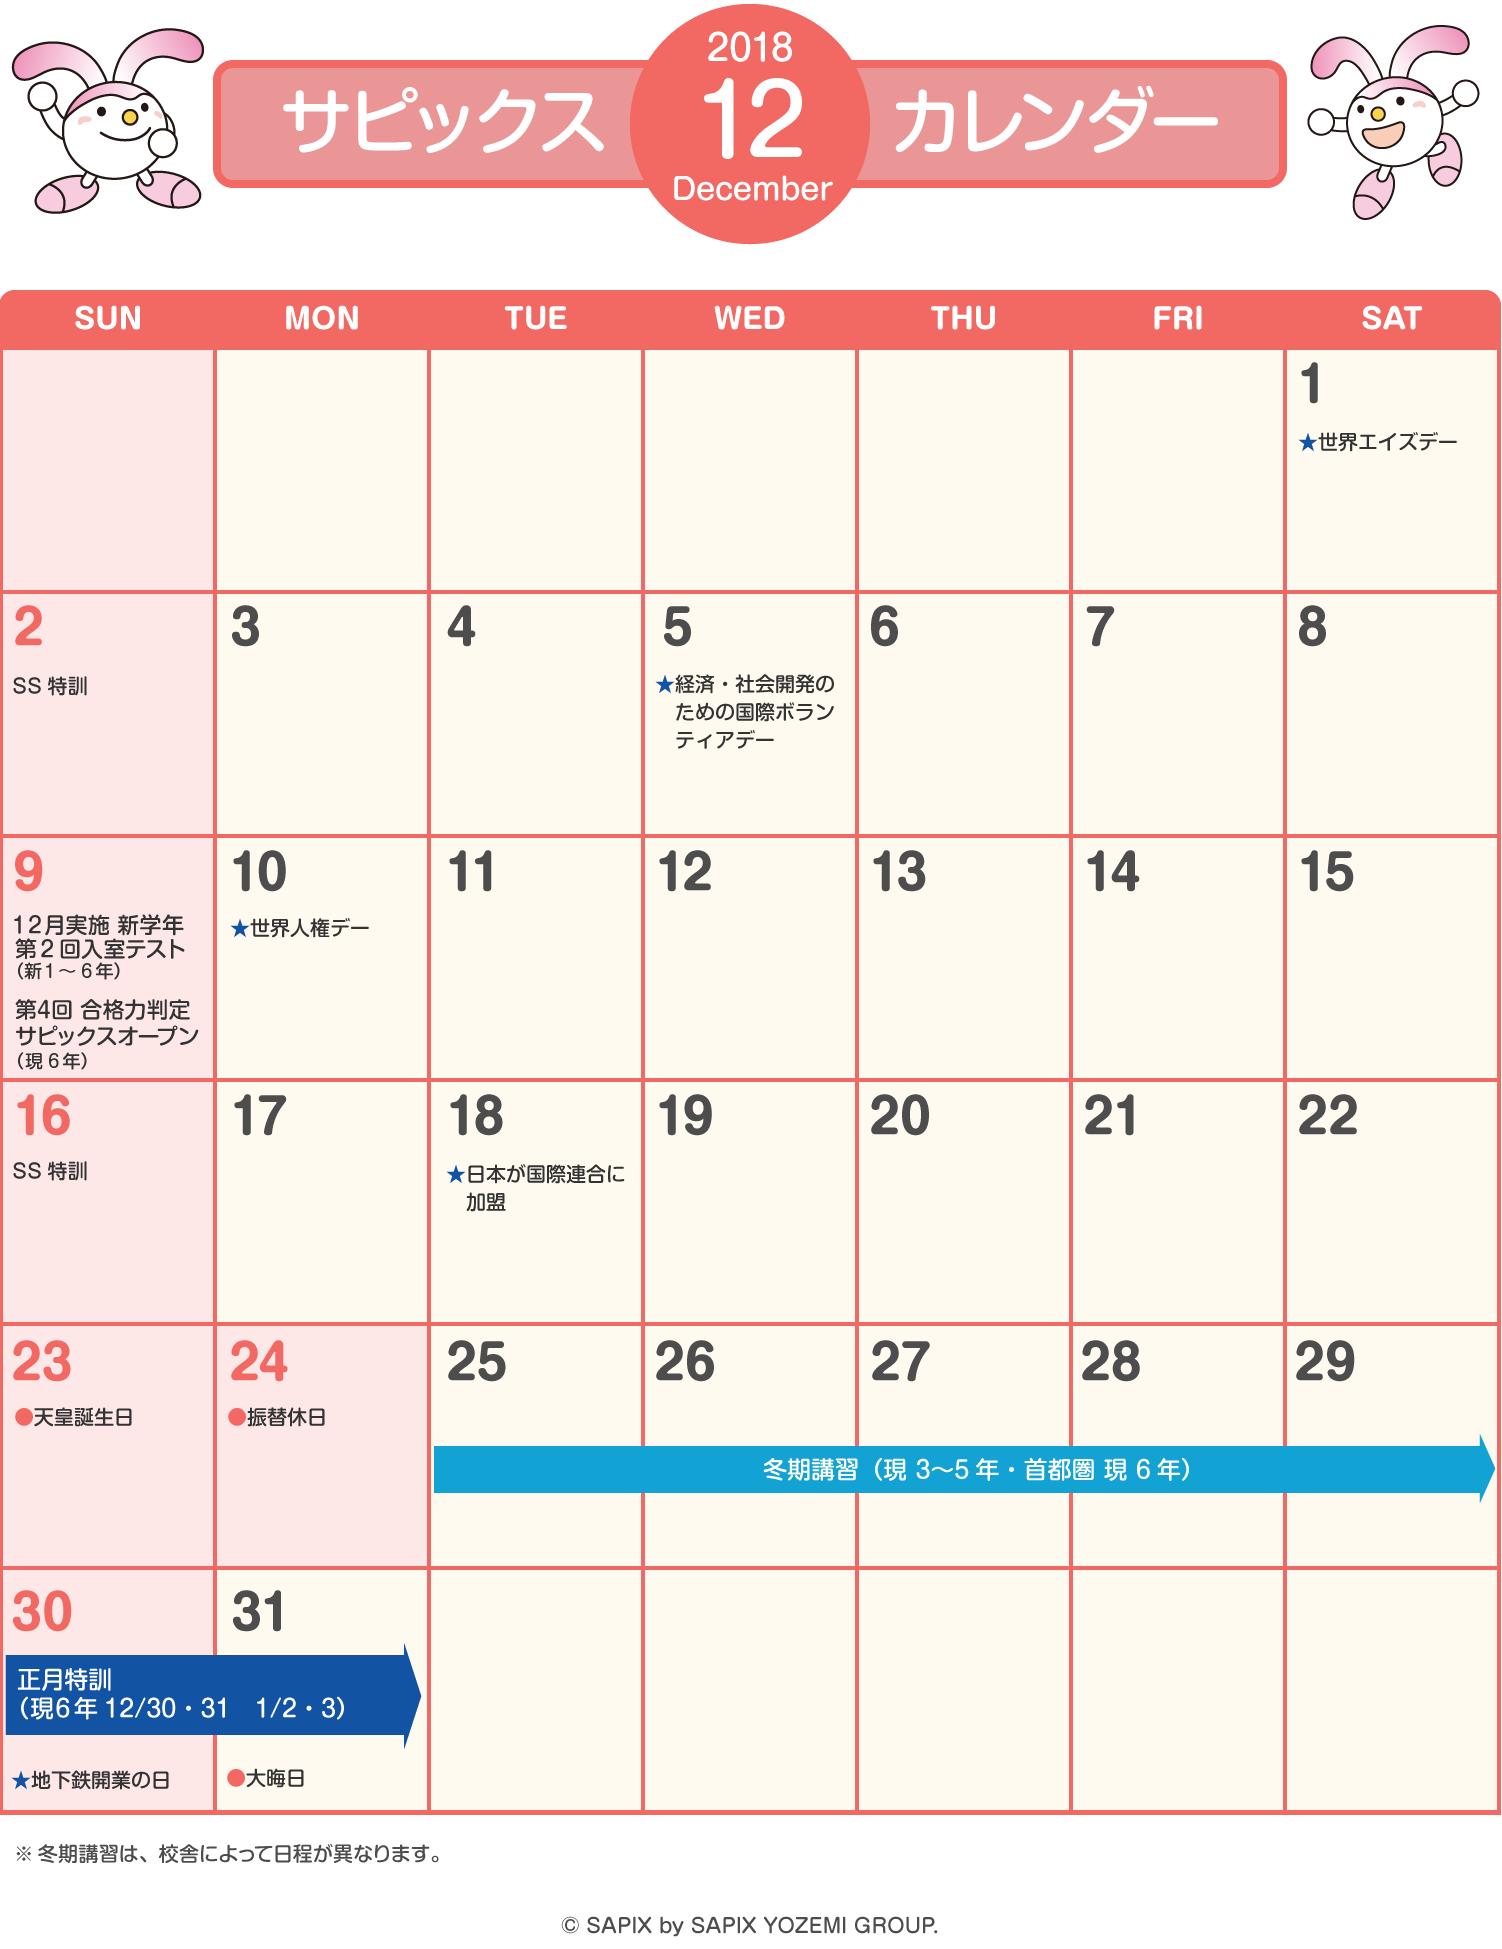 sapix小学部 サピックスカレンダー